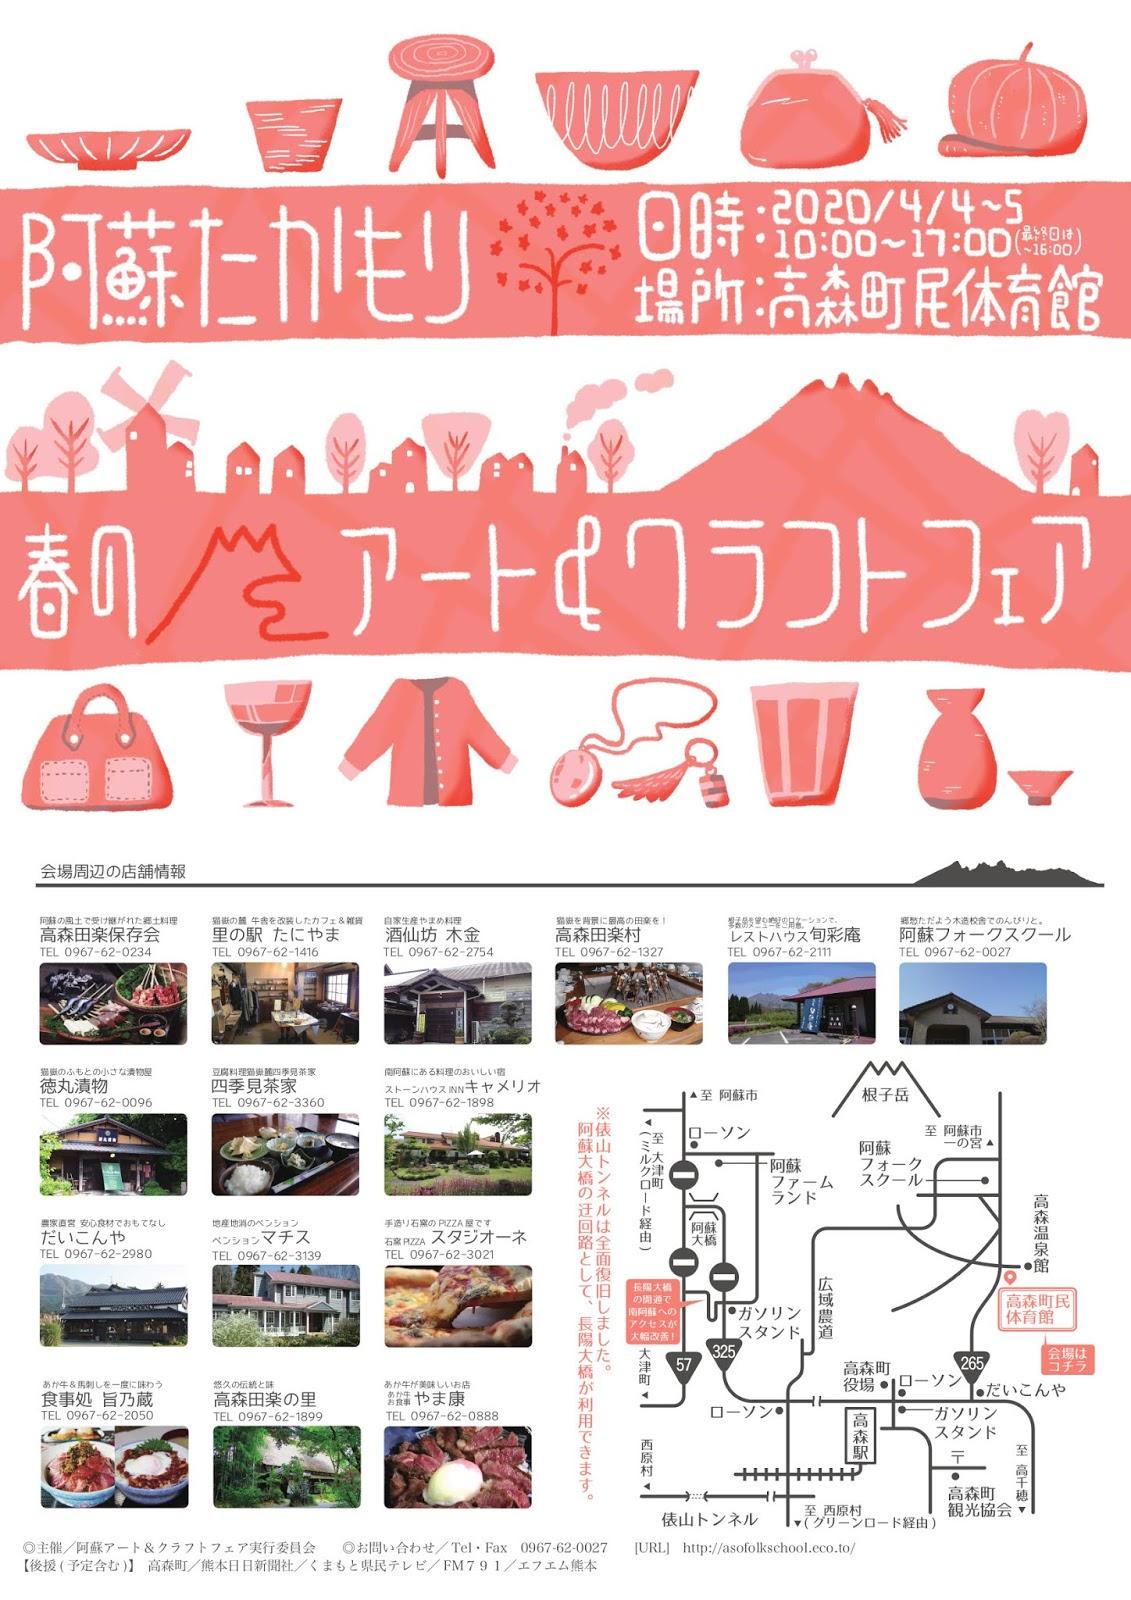 AFS records: 阿蘇たかもり 春のアート&クラフトフェア 出展者情報 とポスター